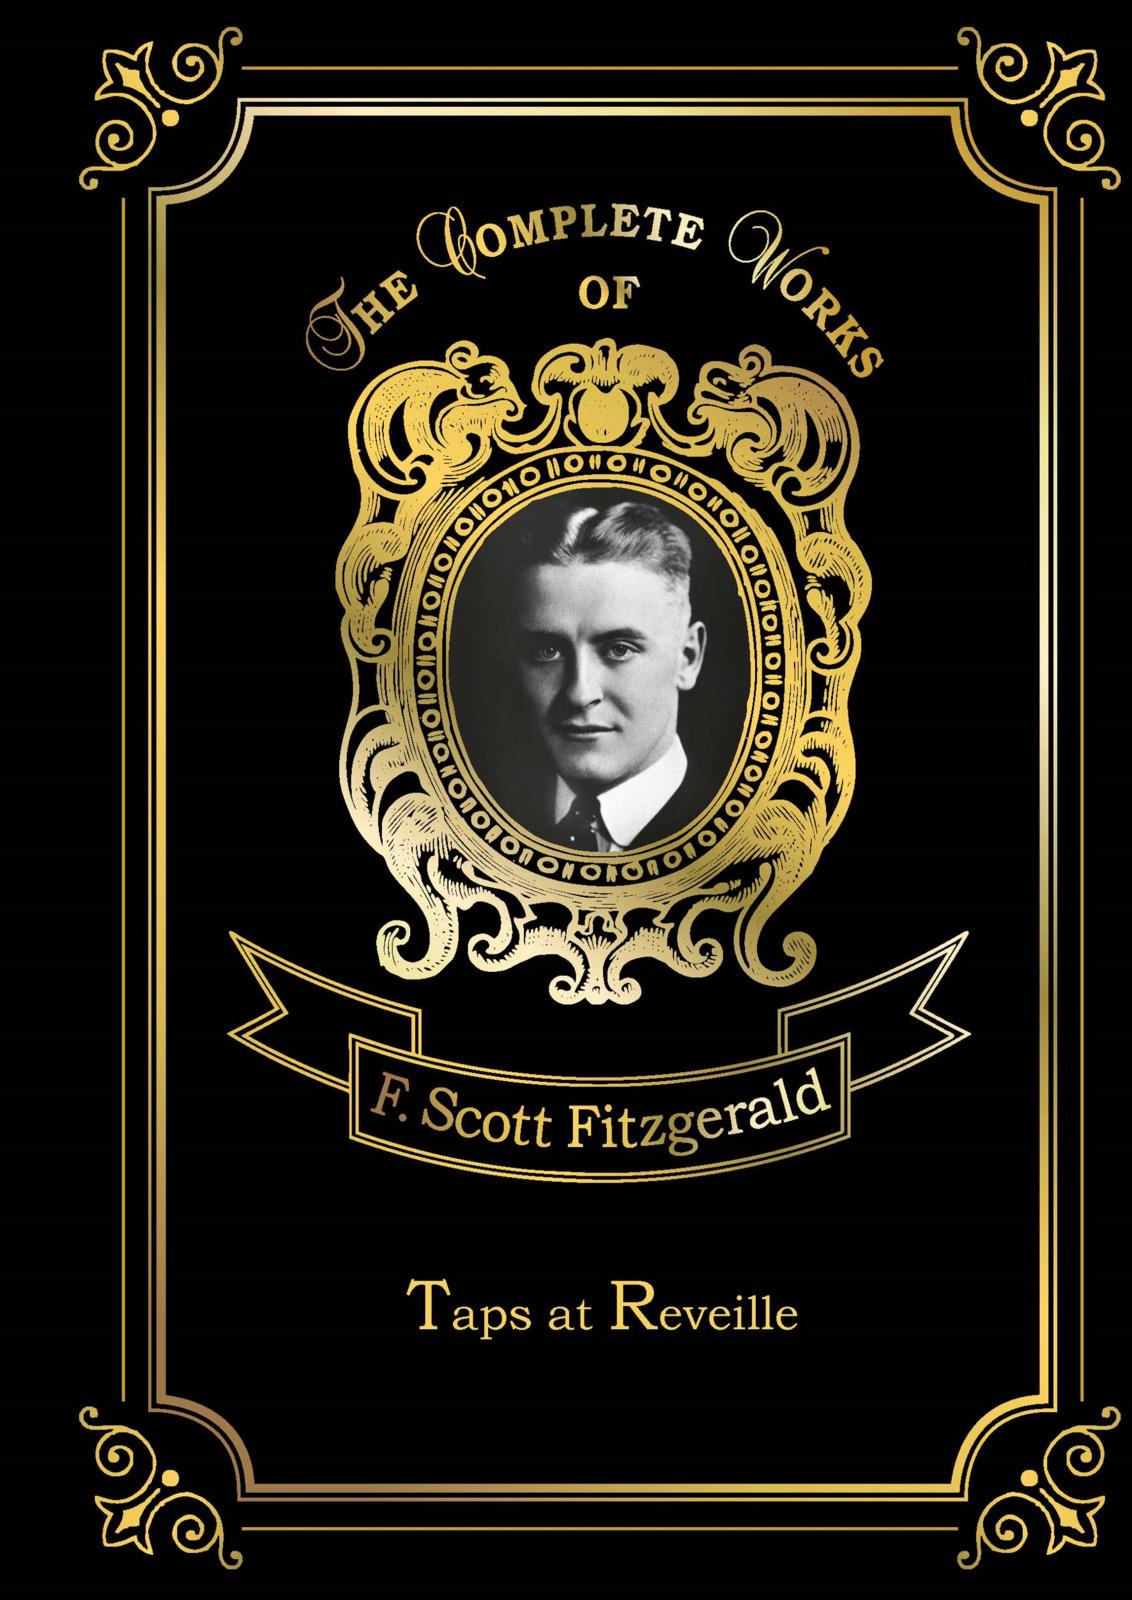 F. S. Fitzgerald Taps at Reveille fitzgerald francis scott taps at reveille